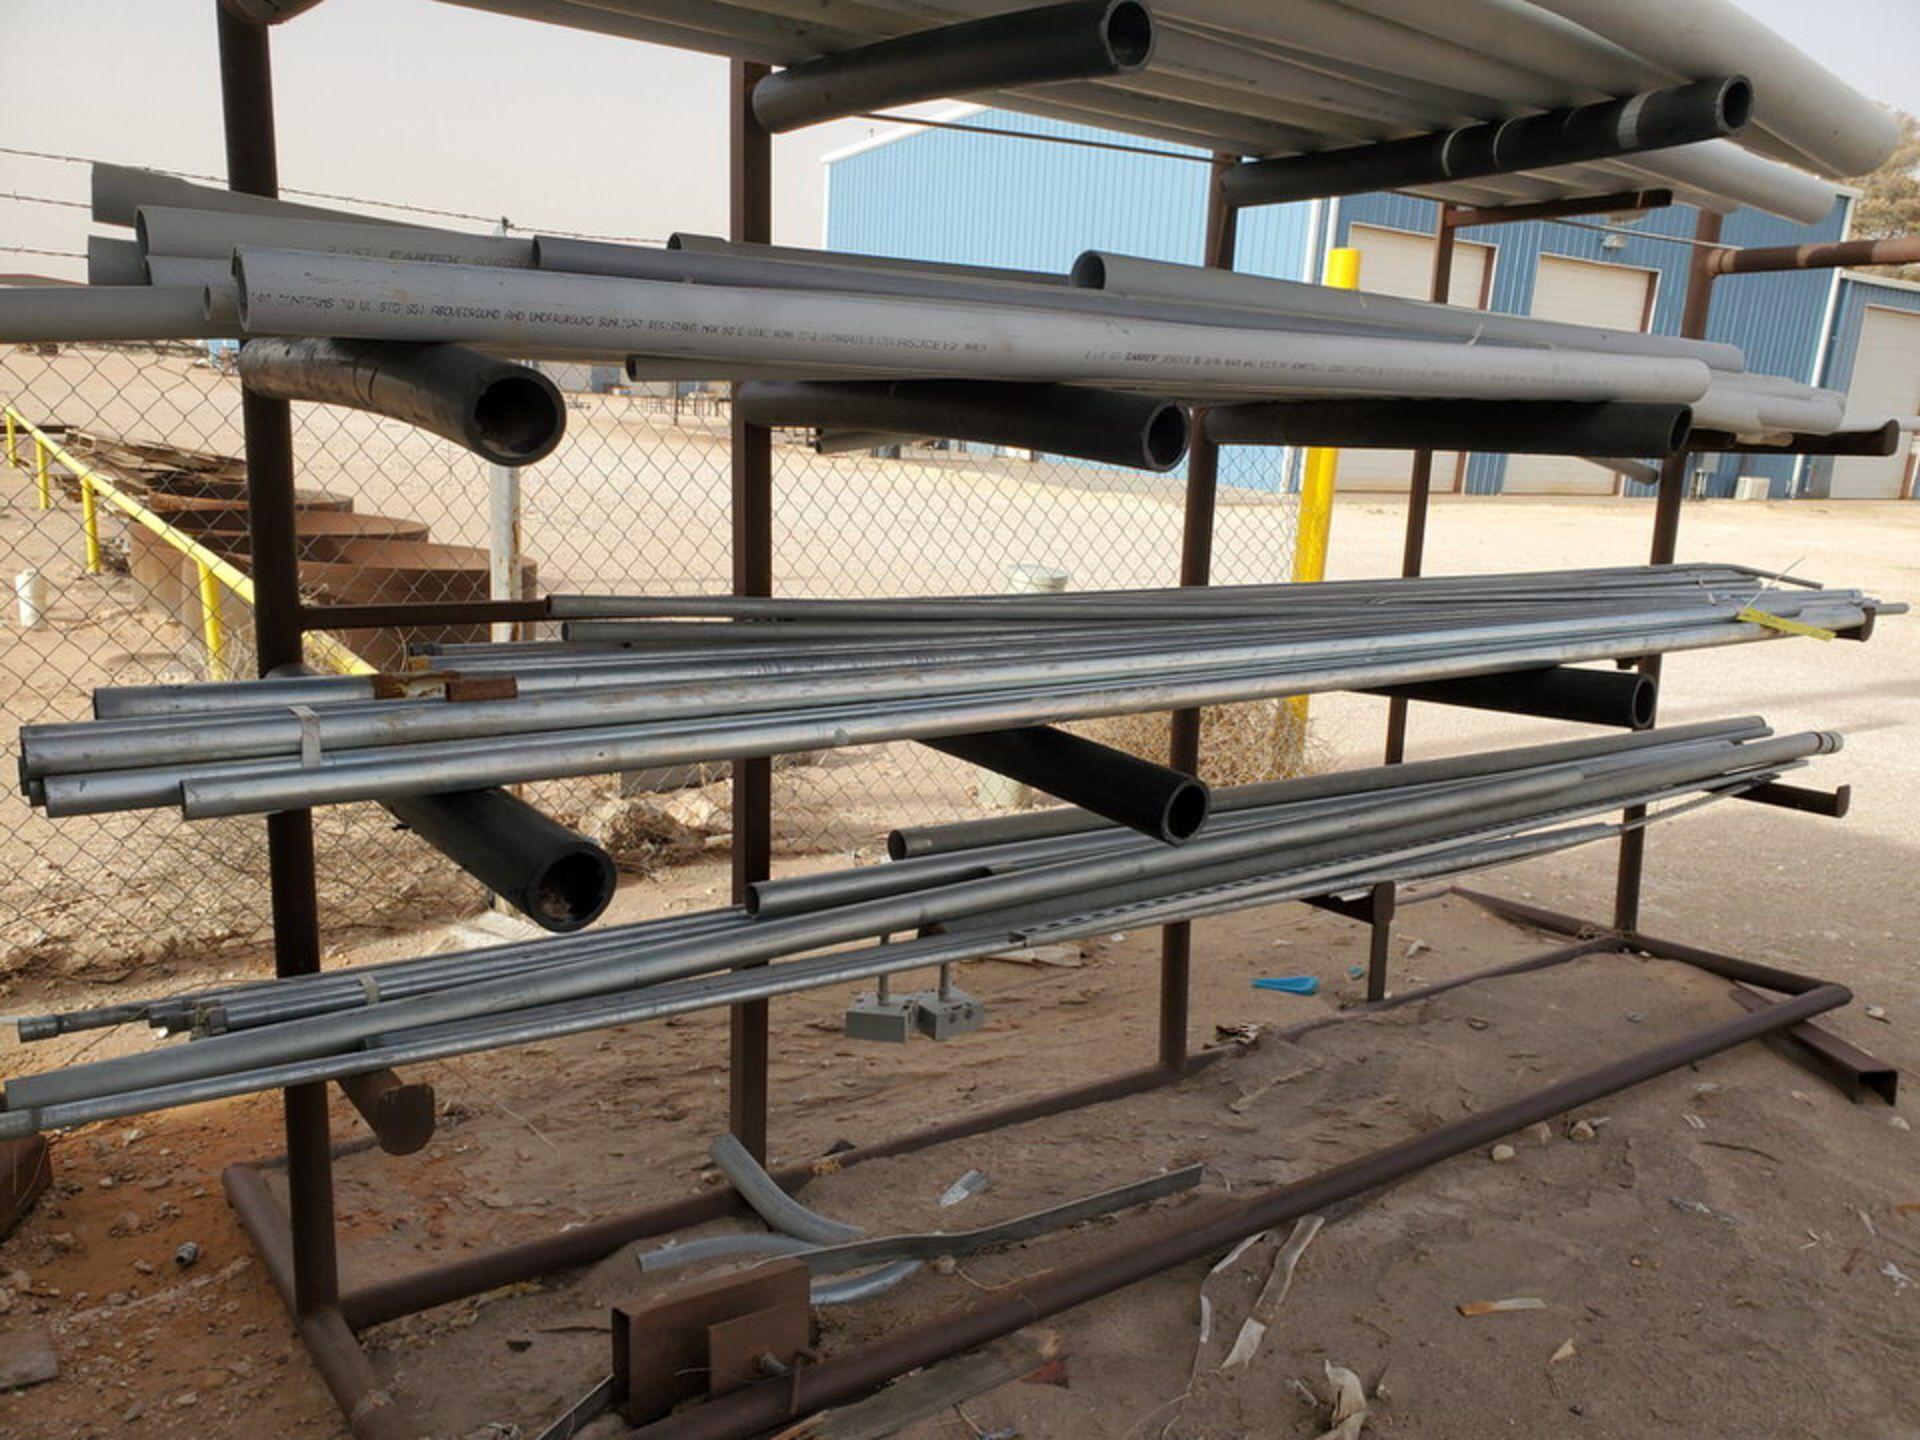 "PVC & Alum. Pipe W/ Conduit Size Range: 1/2"" - 4"" W/ Rack - Image 18 of 18"